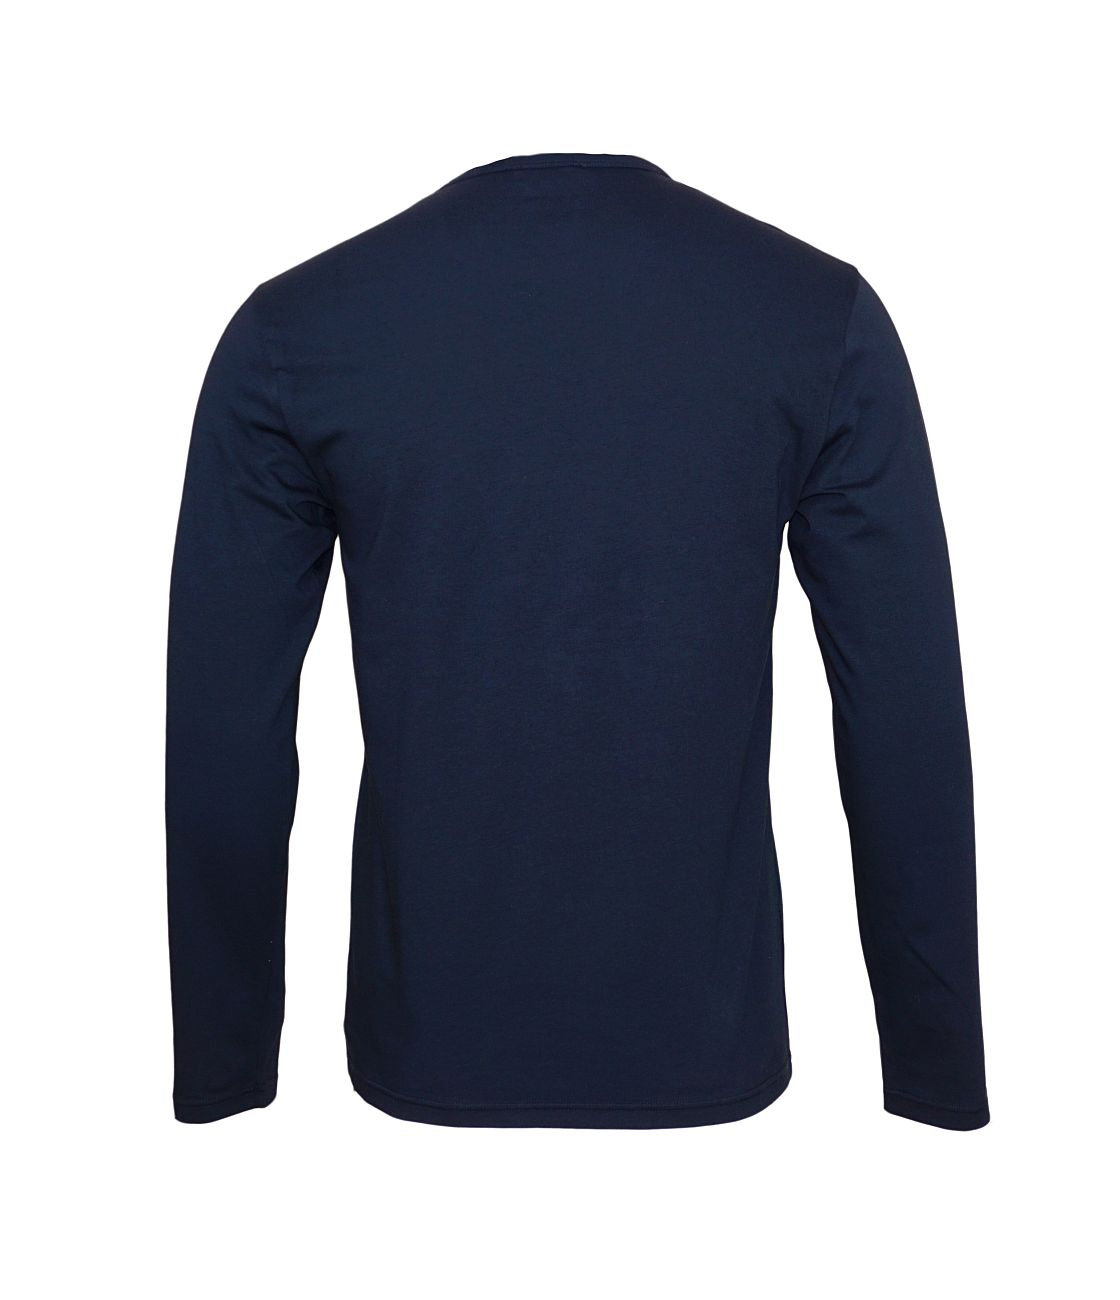 Emporio Armani Longsleeve Rundhals Shirt 111653 8A715 00135 MARINE WX18-EAX